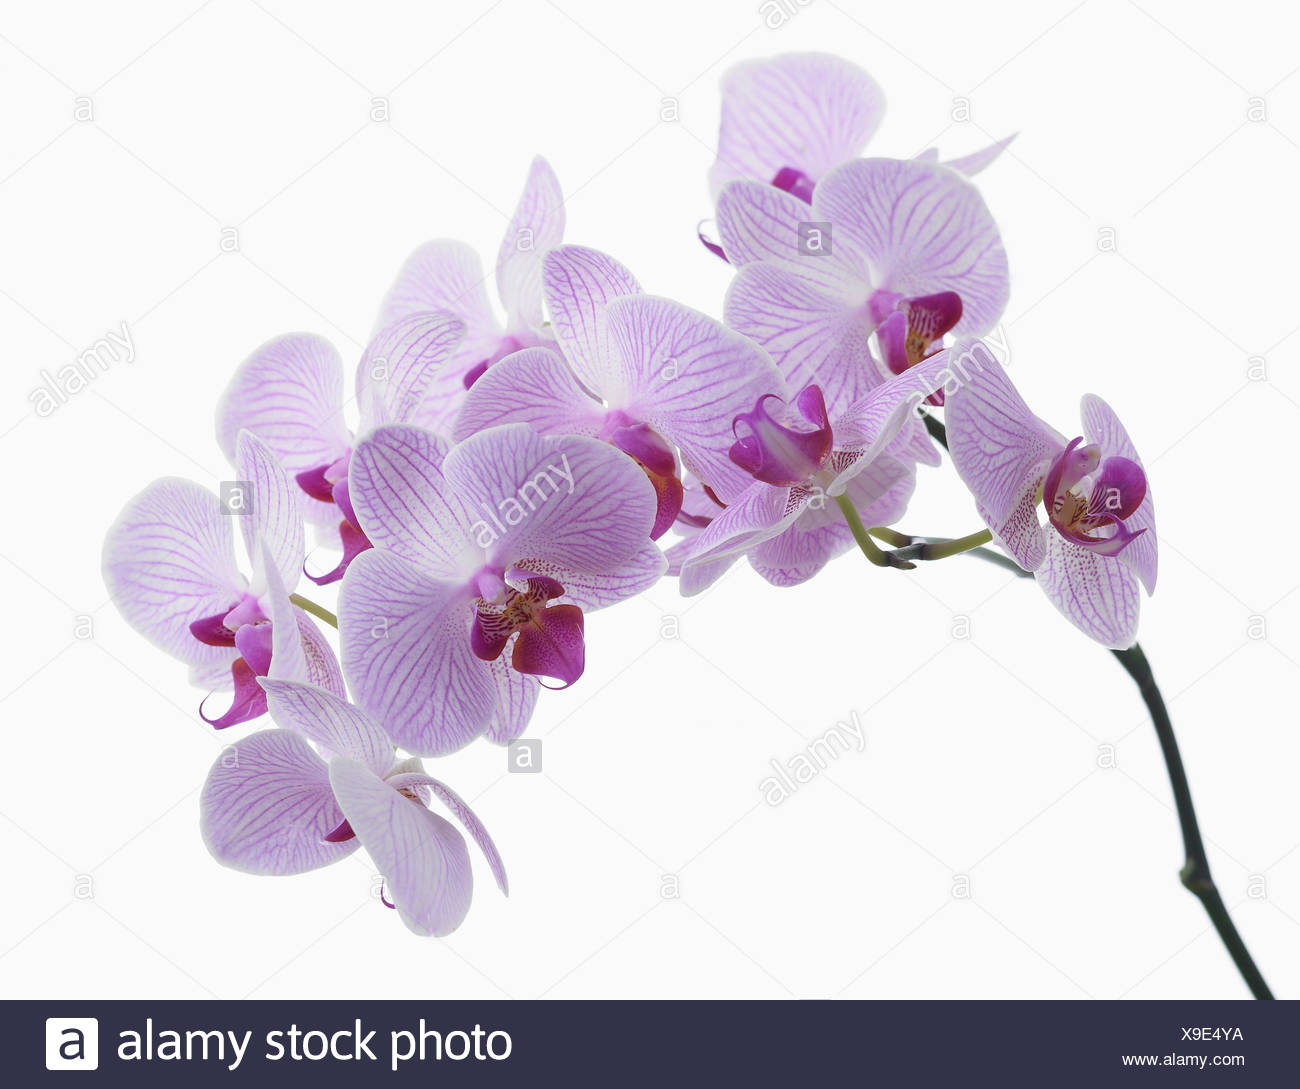 Phalaenopsis Shanghai Moth Orchid Single Stem With Purple Flowers